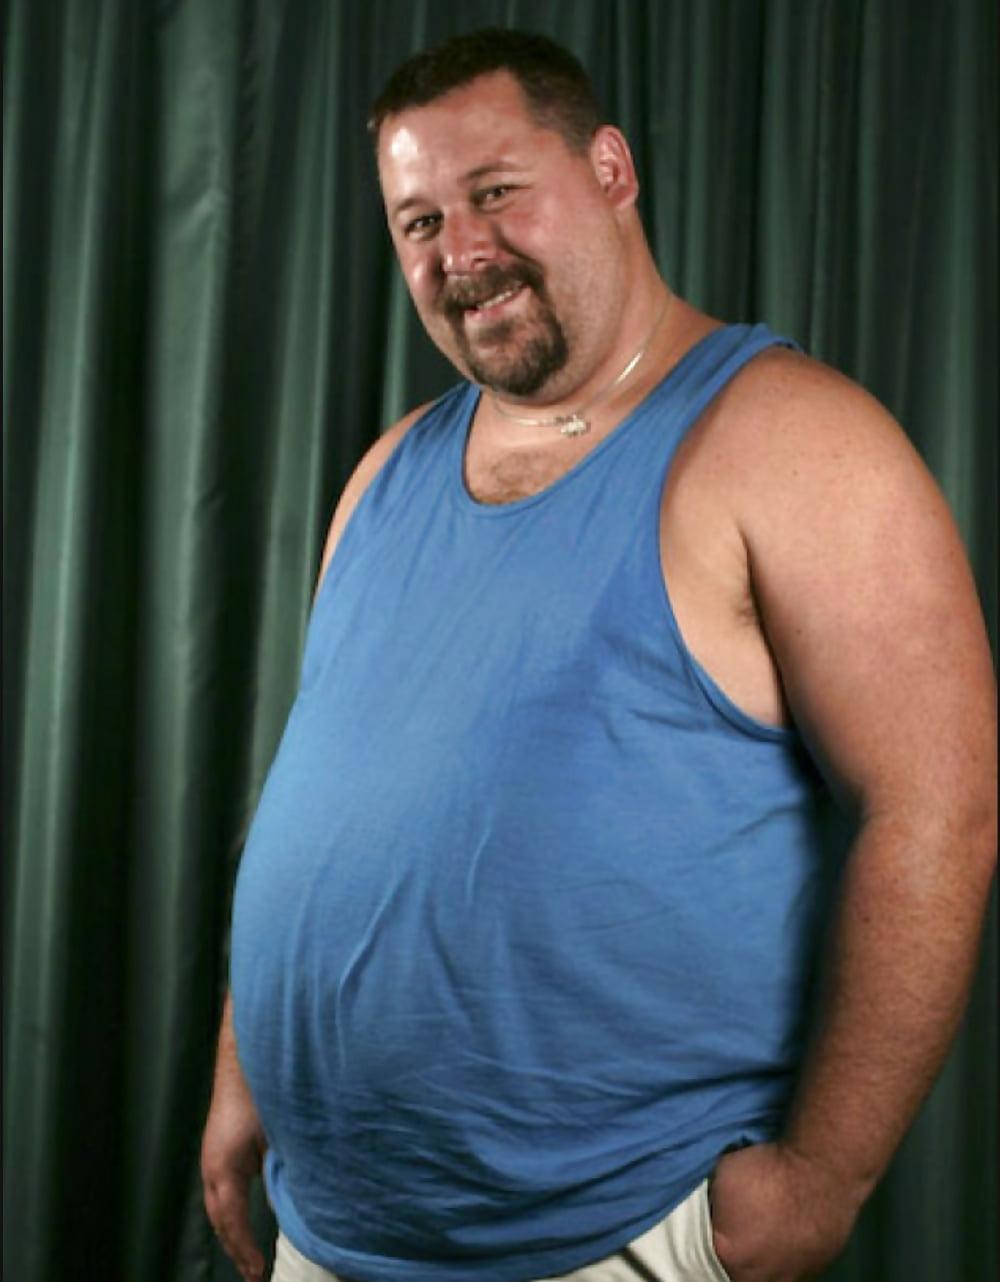 Chubby men place lesbian squirt